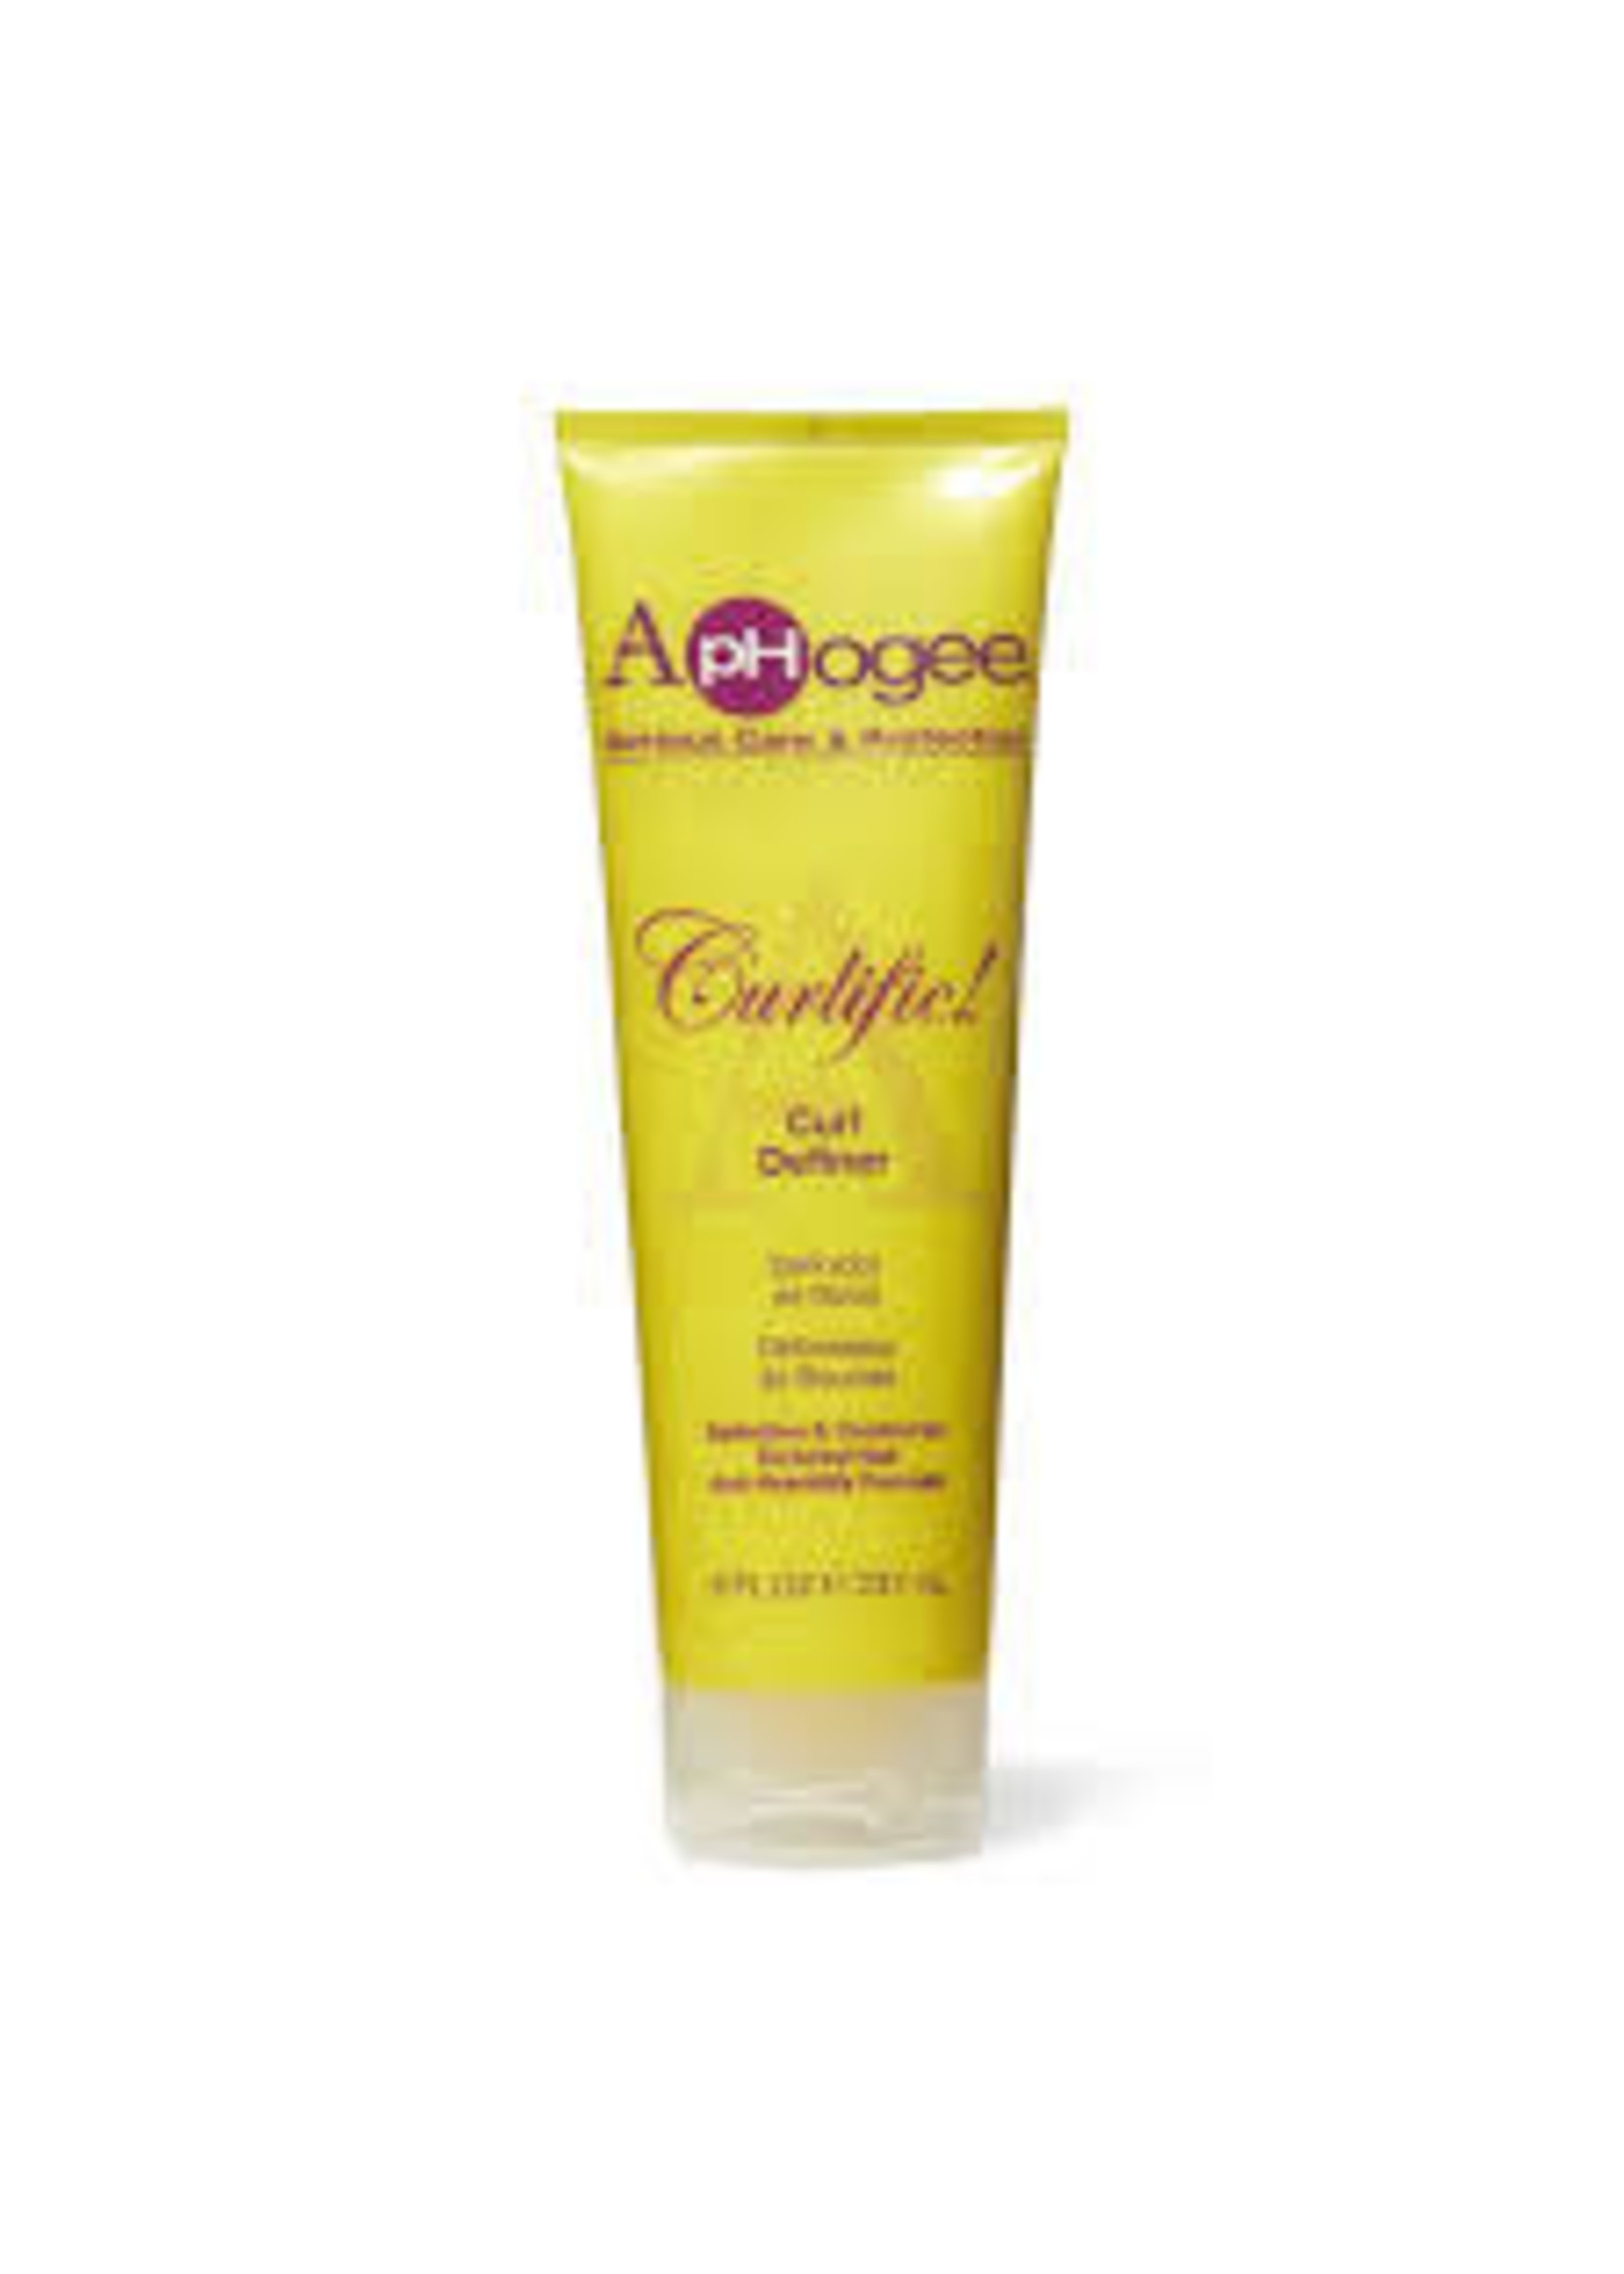 Aphogee Curlific Curl Definer 8oz.